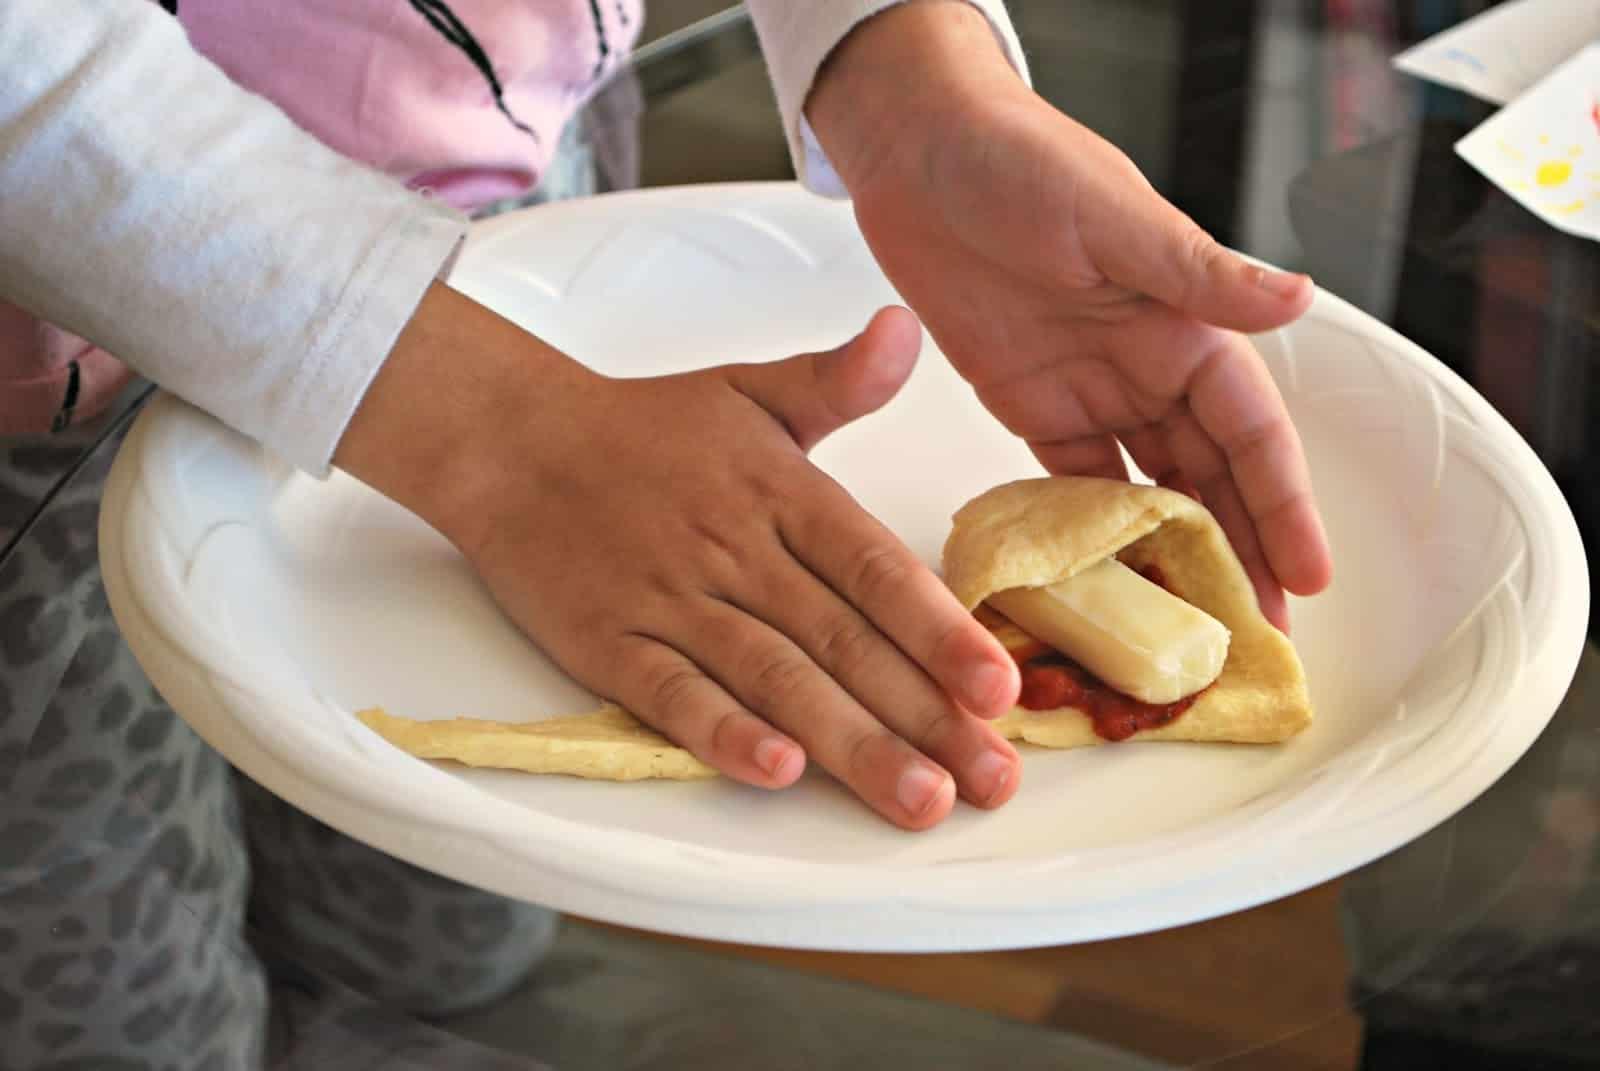 child making pizza crescents